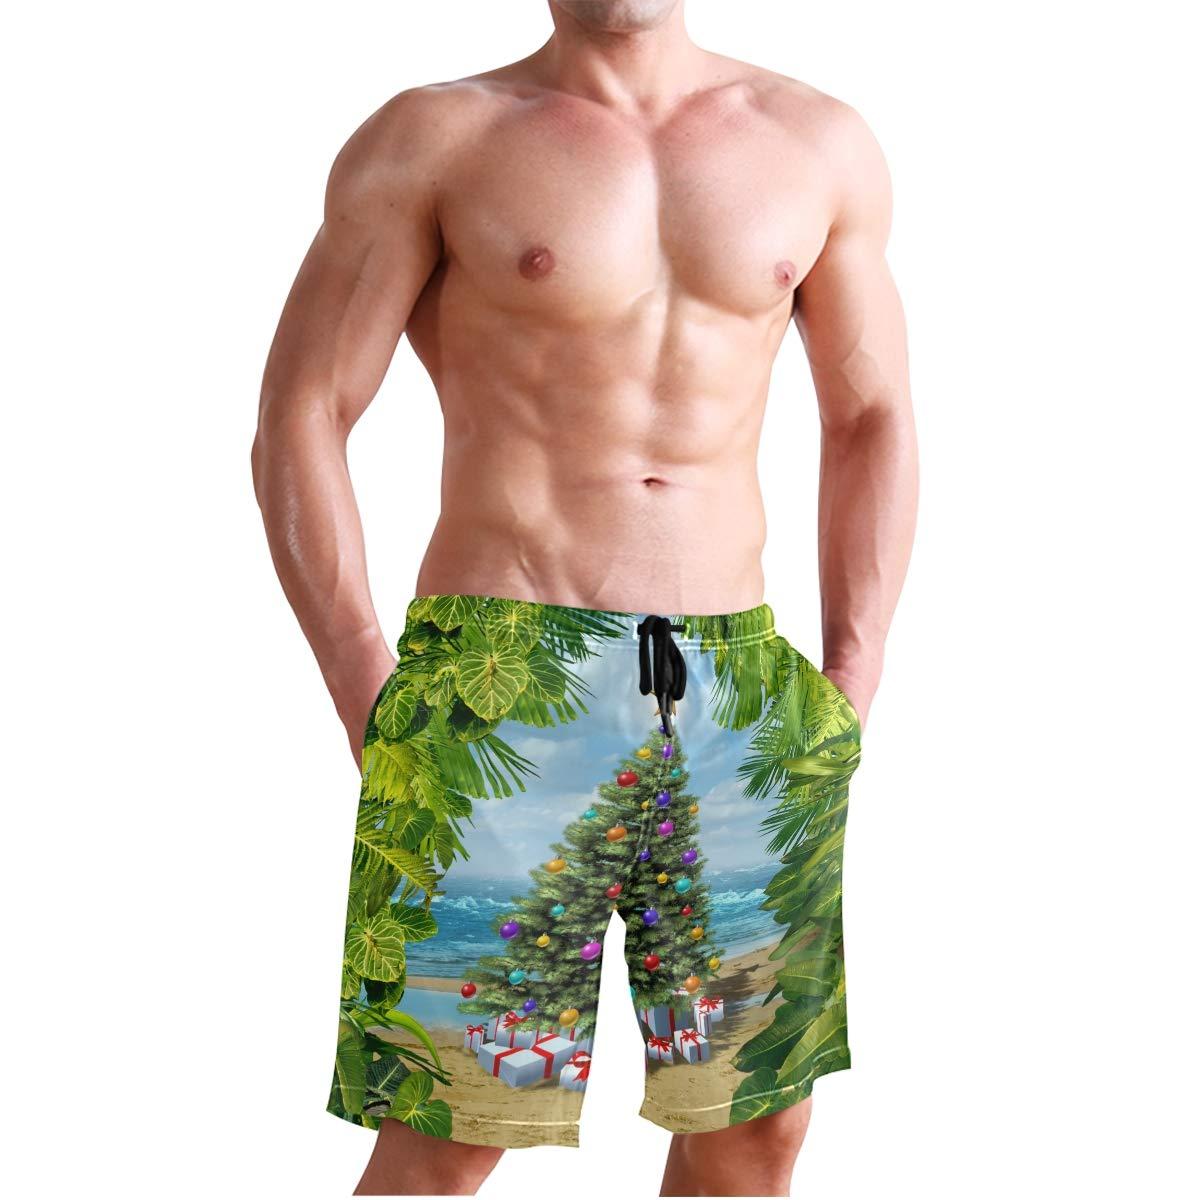 Mens Swim Trunks Christmas Tree Beach Tropical Leaf Quick Dry Beach Board Short with Mesh Lining